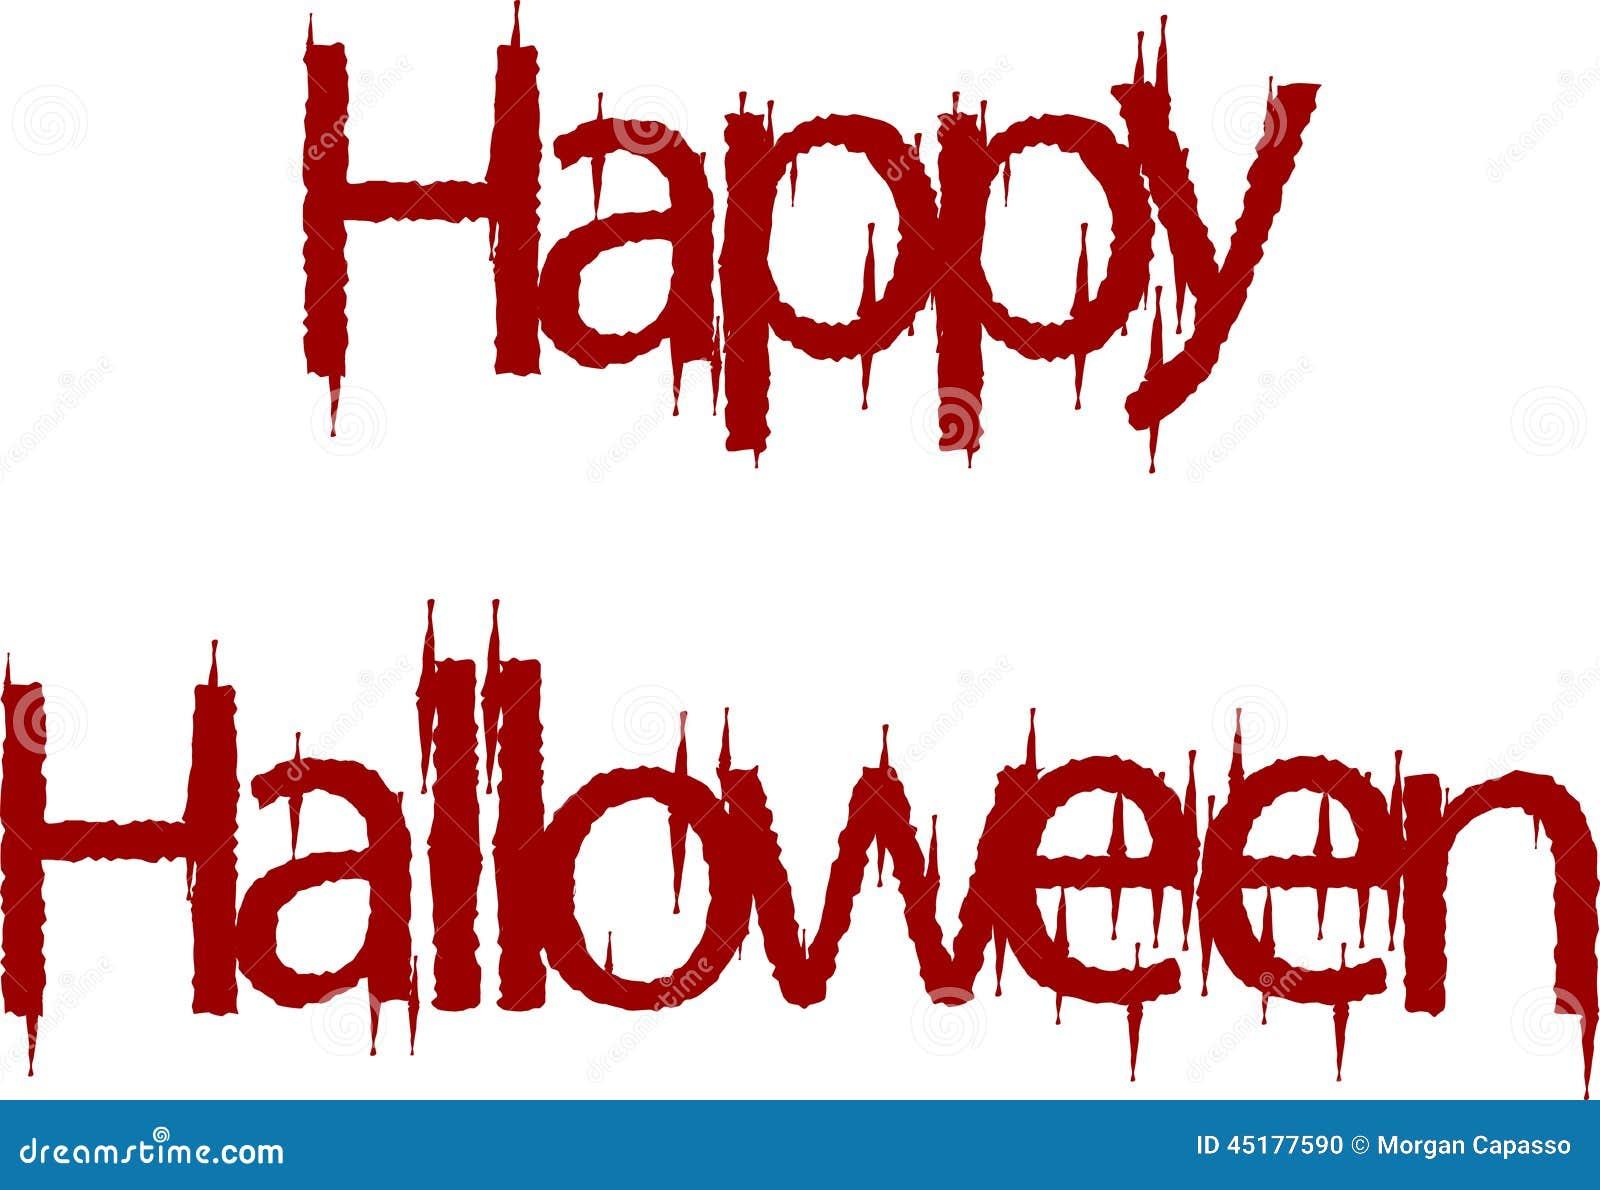 royalty free stock photo - Halloween Writing Font